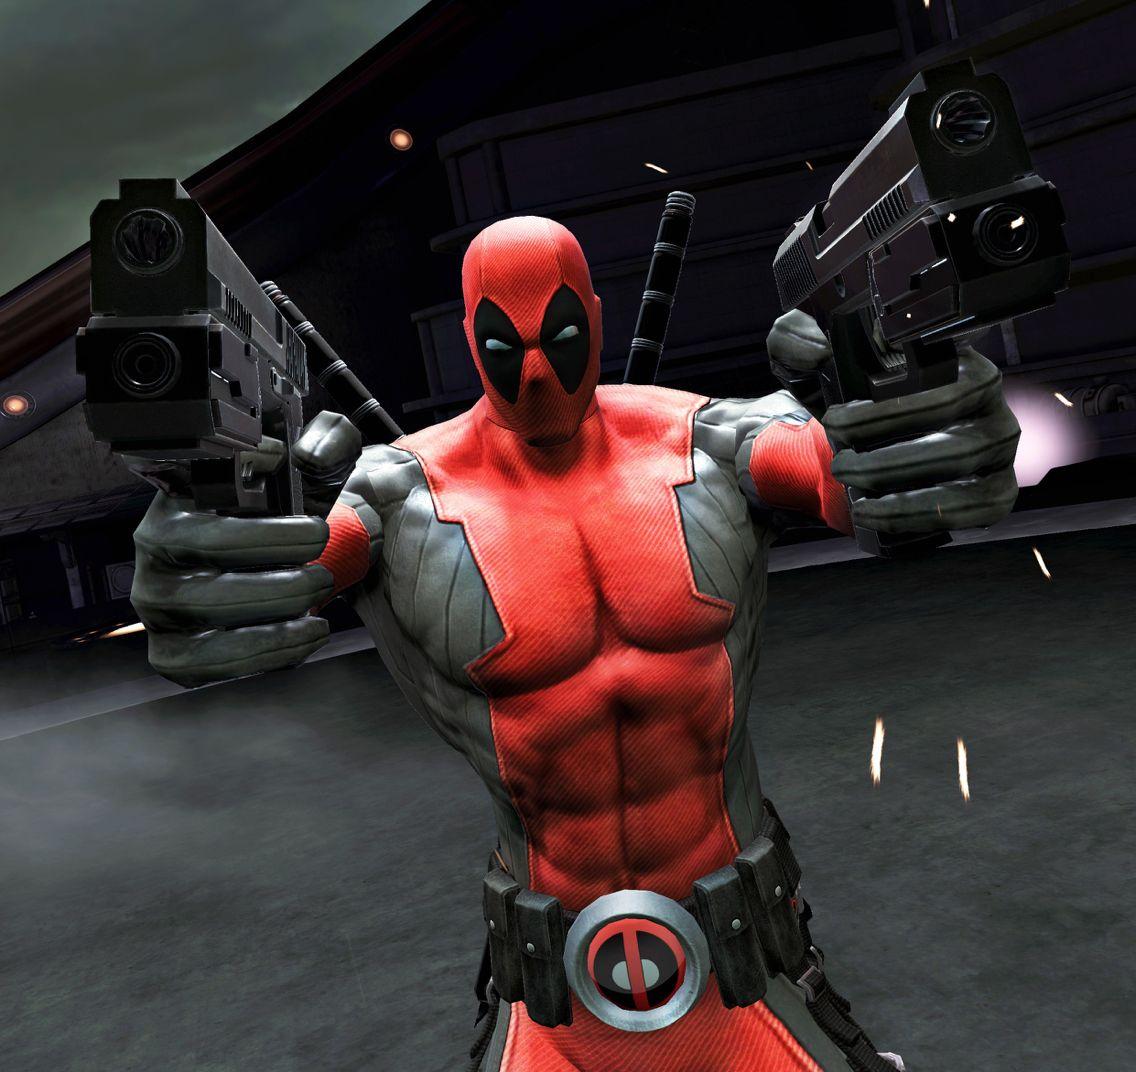 Pin by Trent on Xmen Universe Deadpool, Deadpool movie